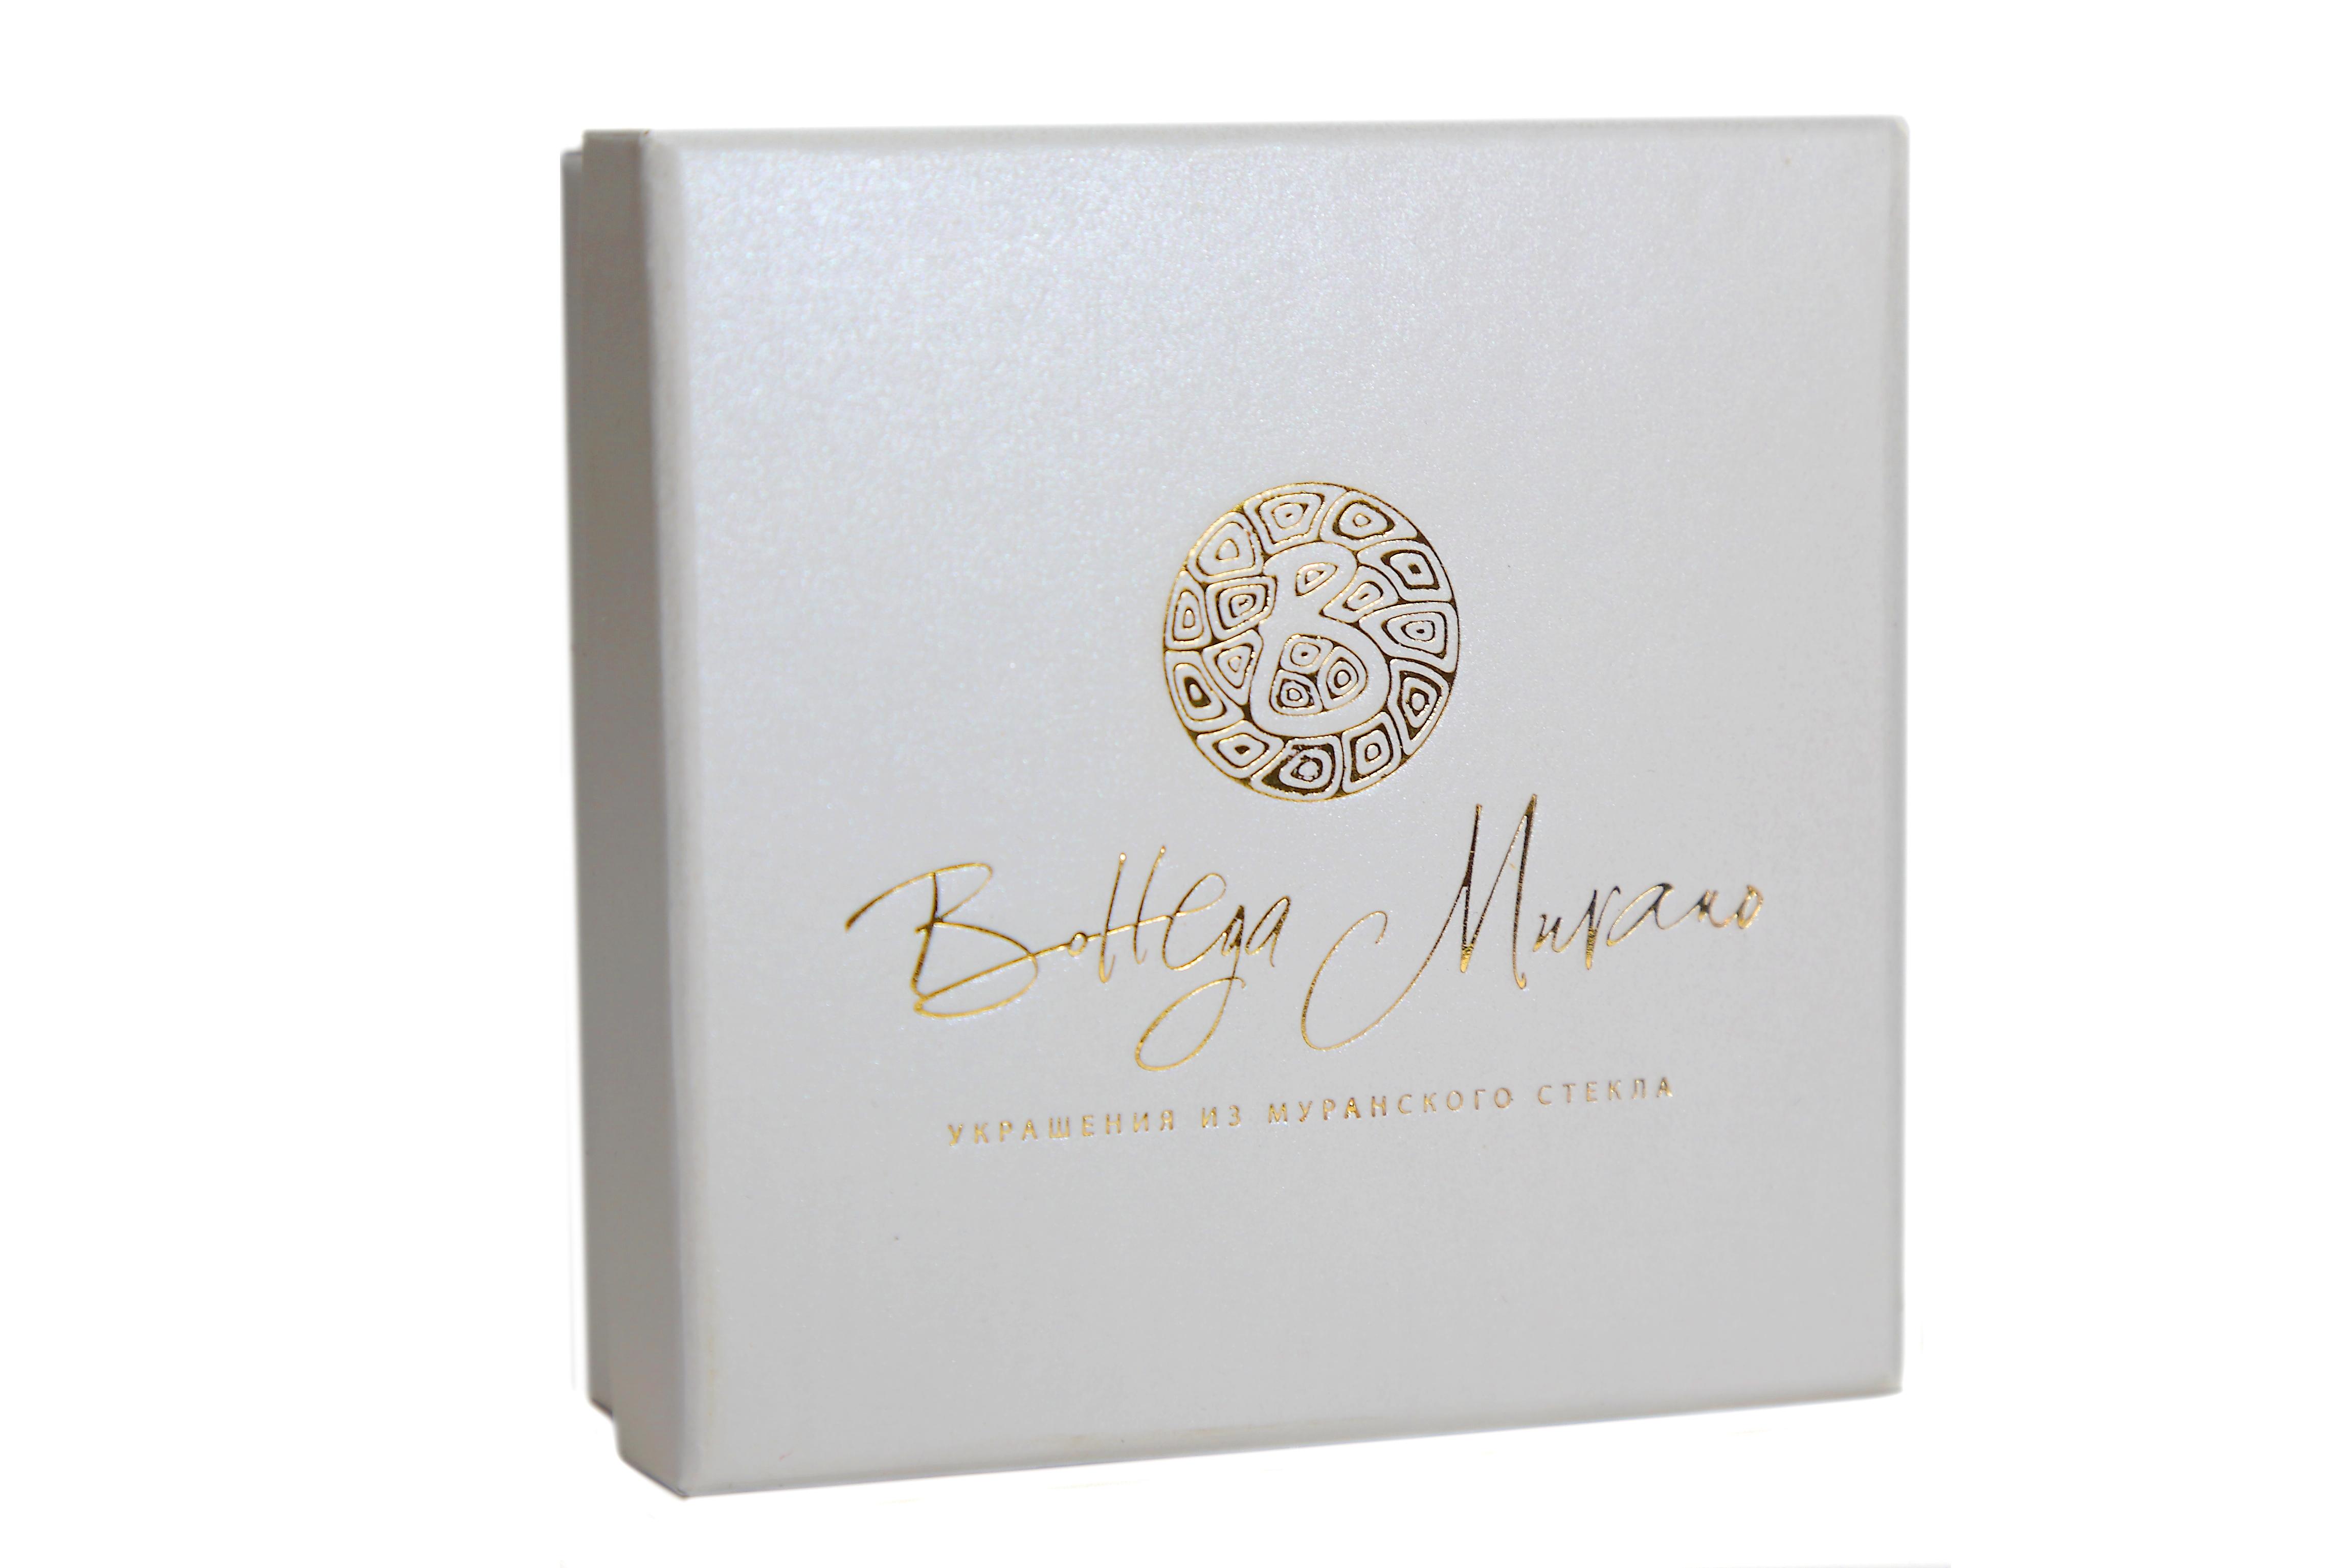 Комплект бижутерии Bottega Murano (9358)